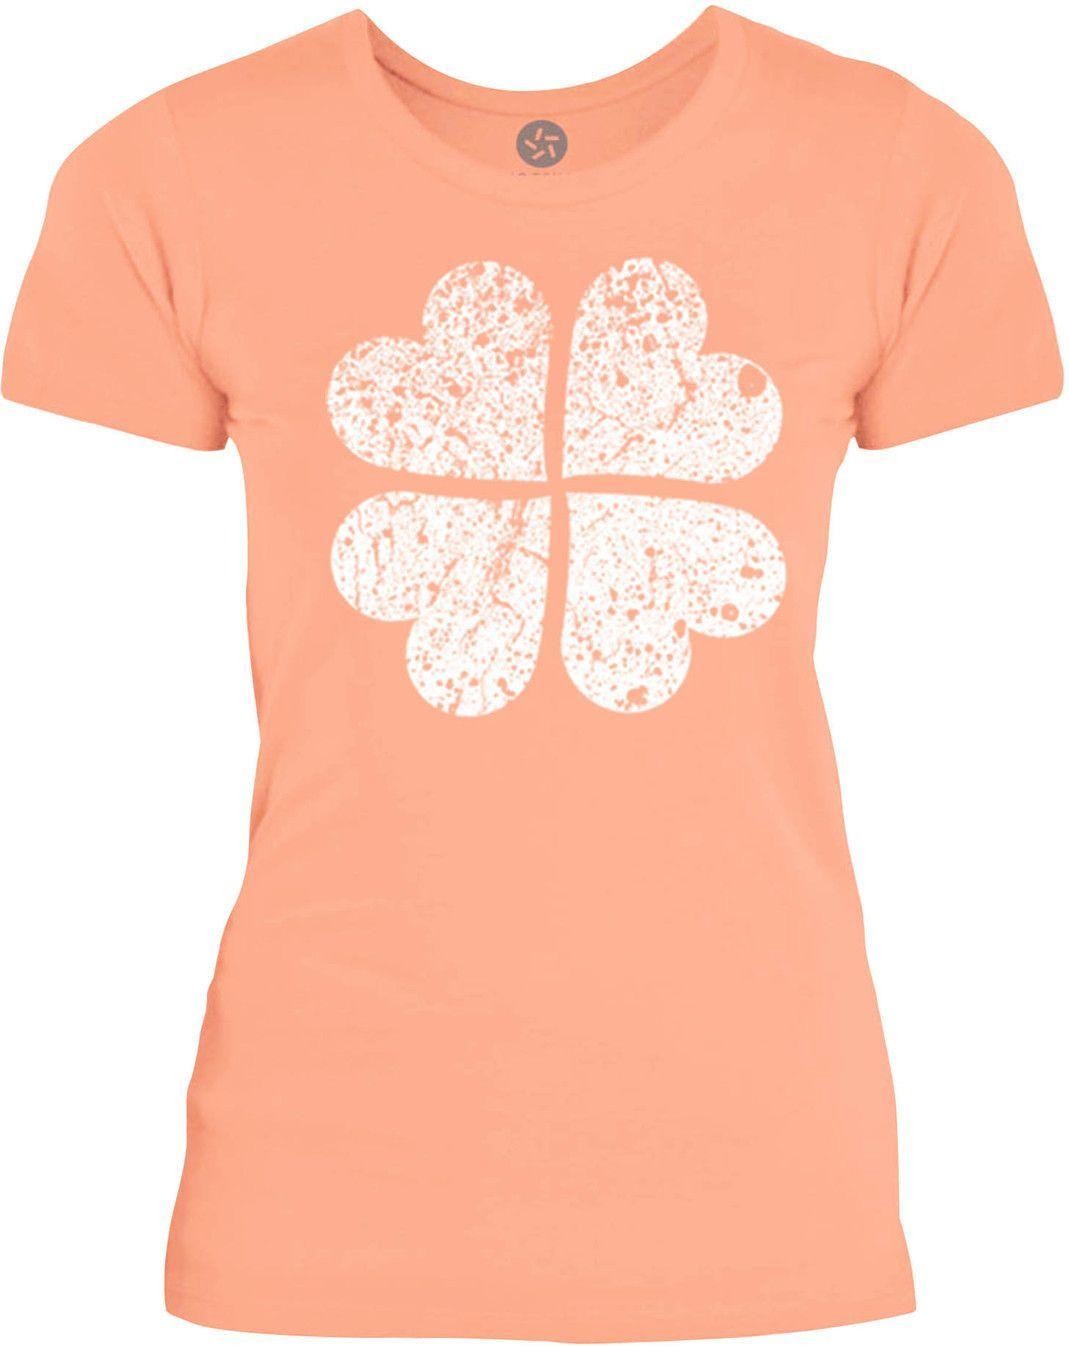 Big Texas Distressed Clover Heart (White) Womens Fine Jersey T-Shirt